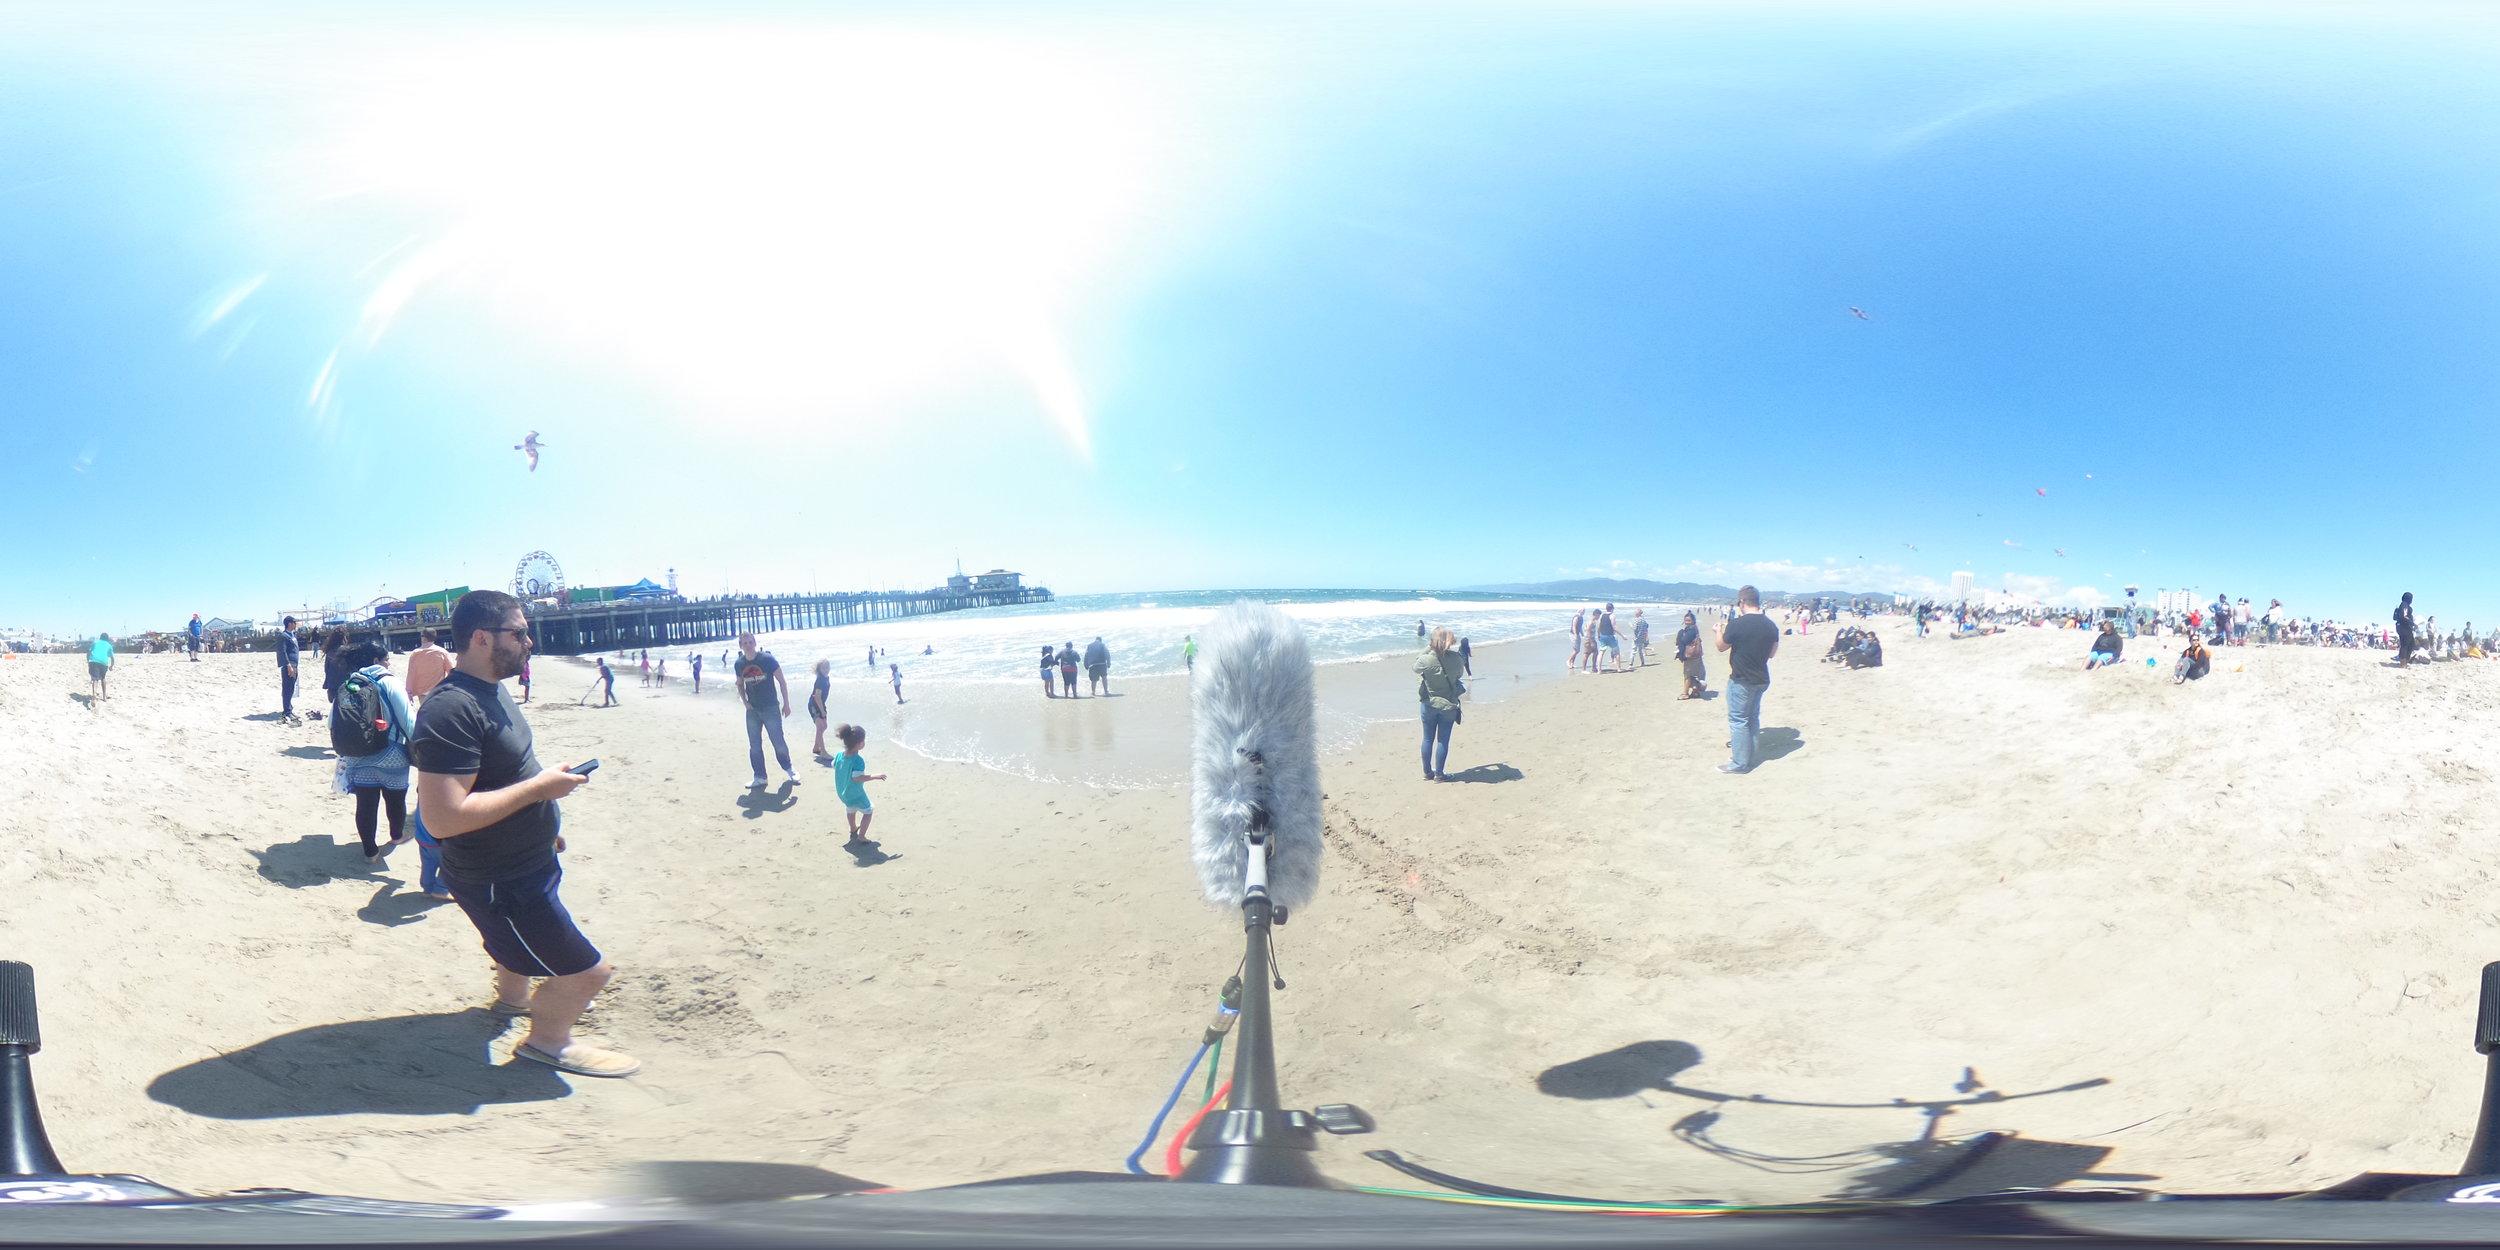 EXT_Day_Beach_ConstantWalla_KidsPlaying_MediumLaughter_MediumWaves_MediumWind_JPEG.JPG